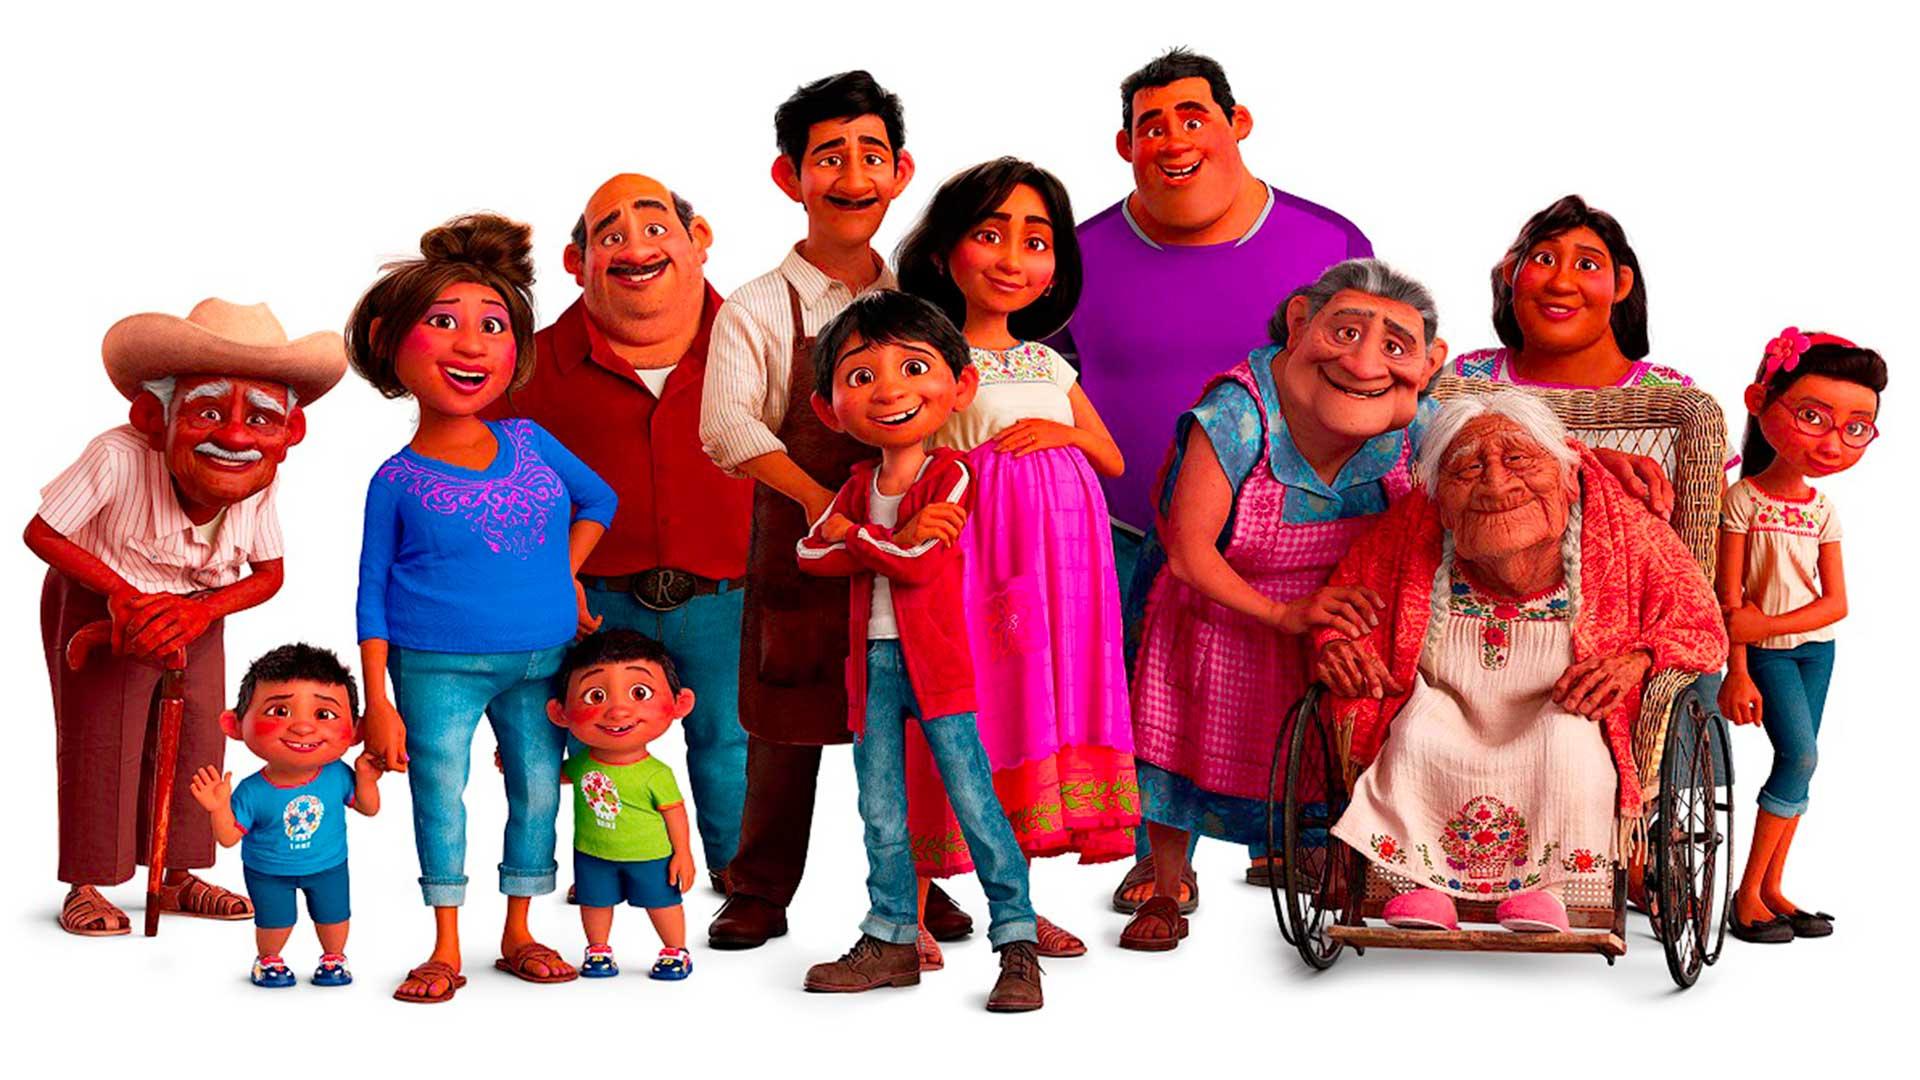 La familia del film COCO. Foto: Disney-Pixar